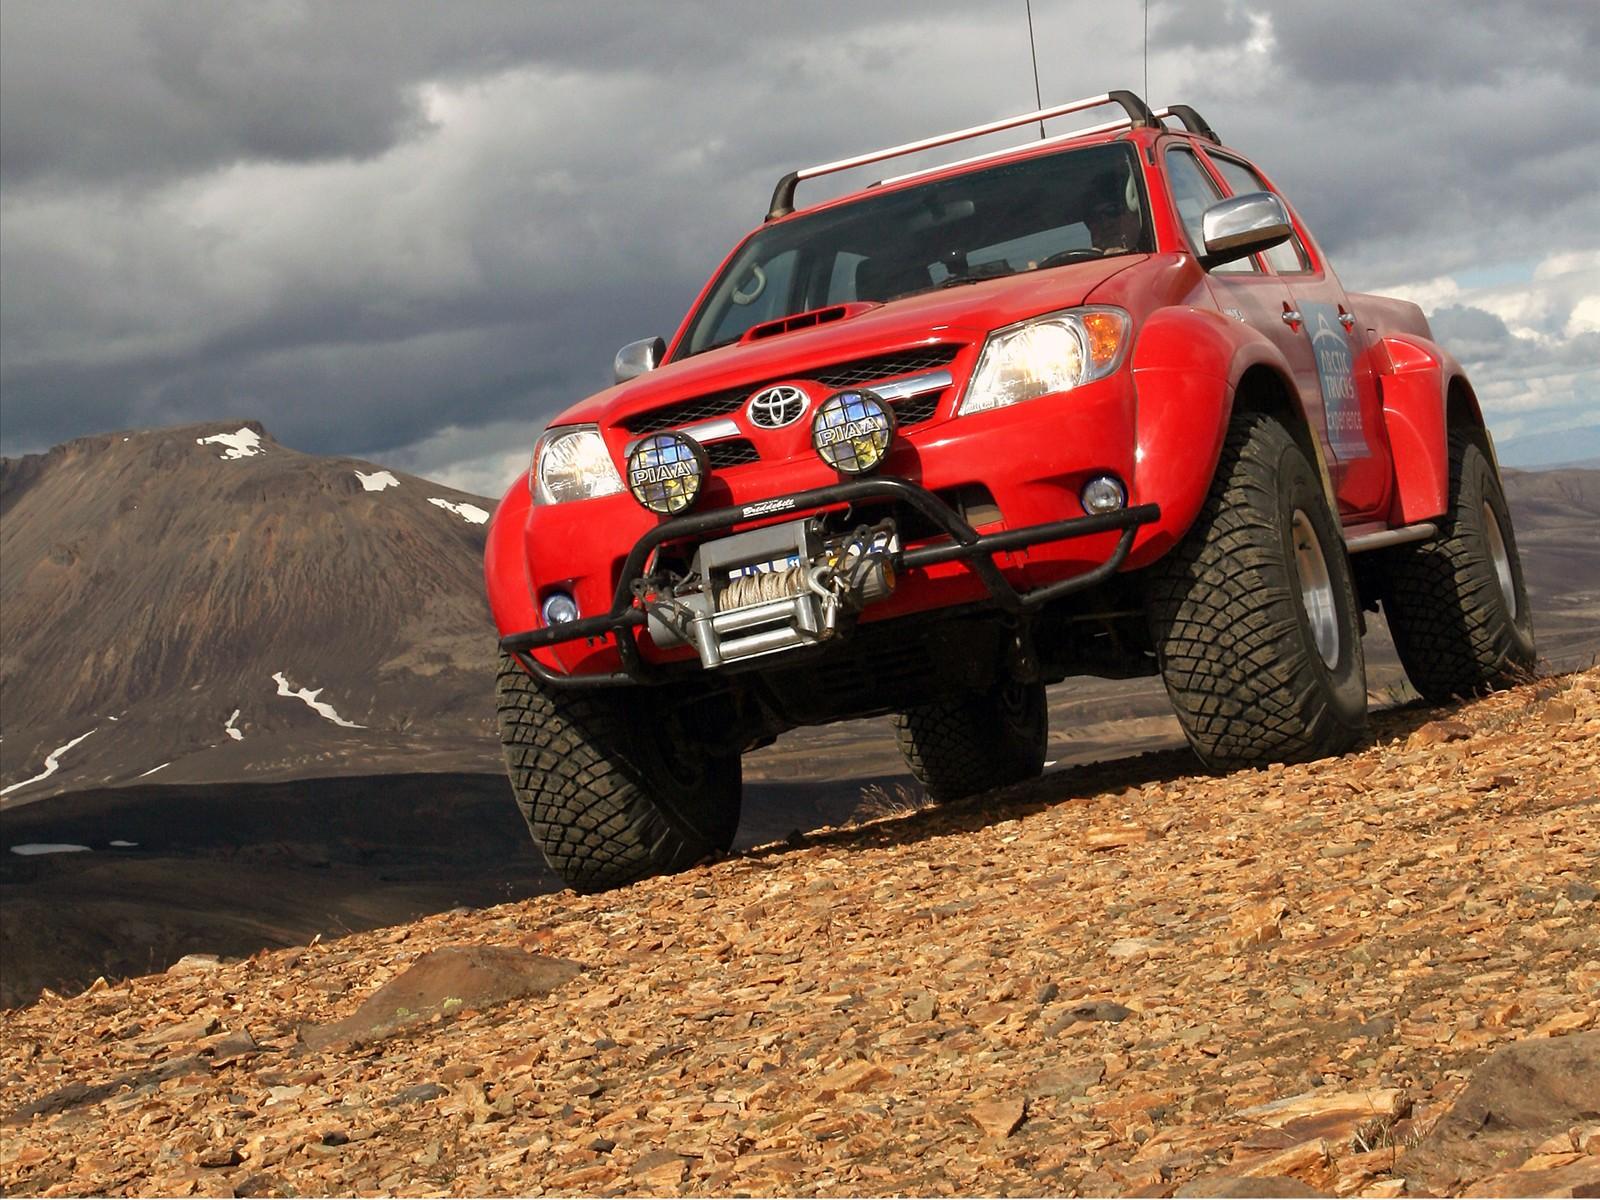 Toyota Hilux Wallpaper 14   1600 X 1200 stmednet 1600x1200